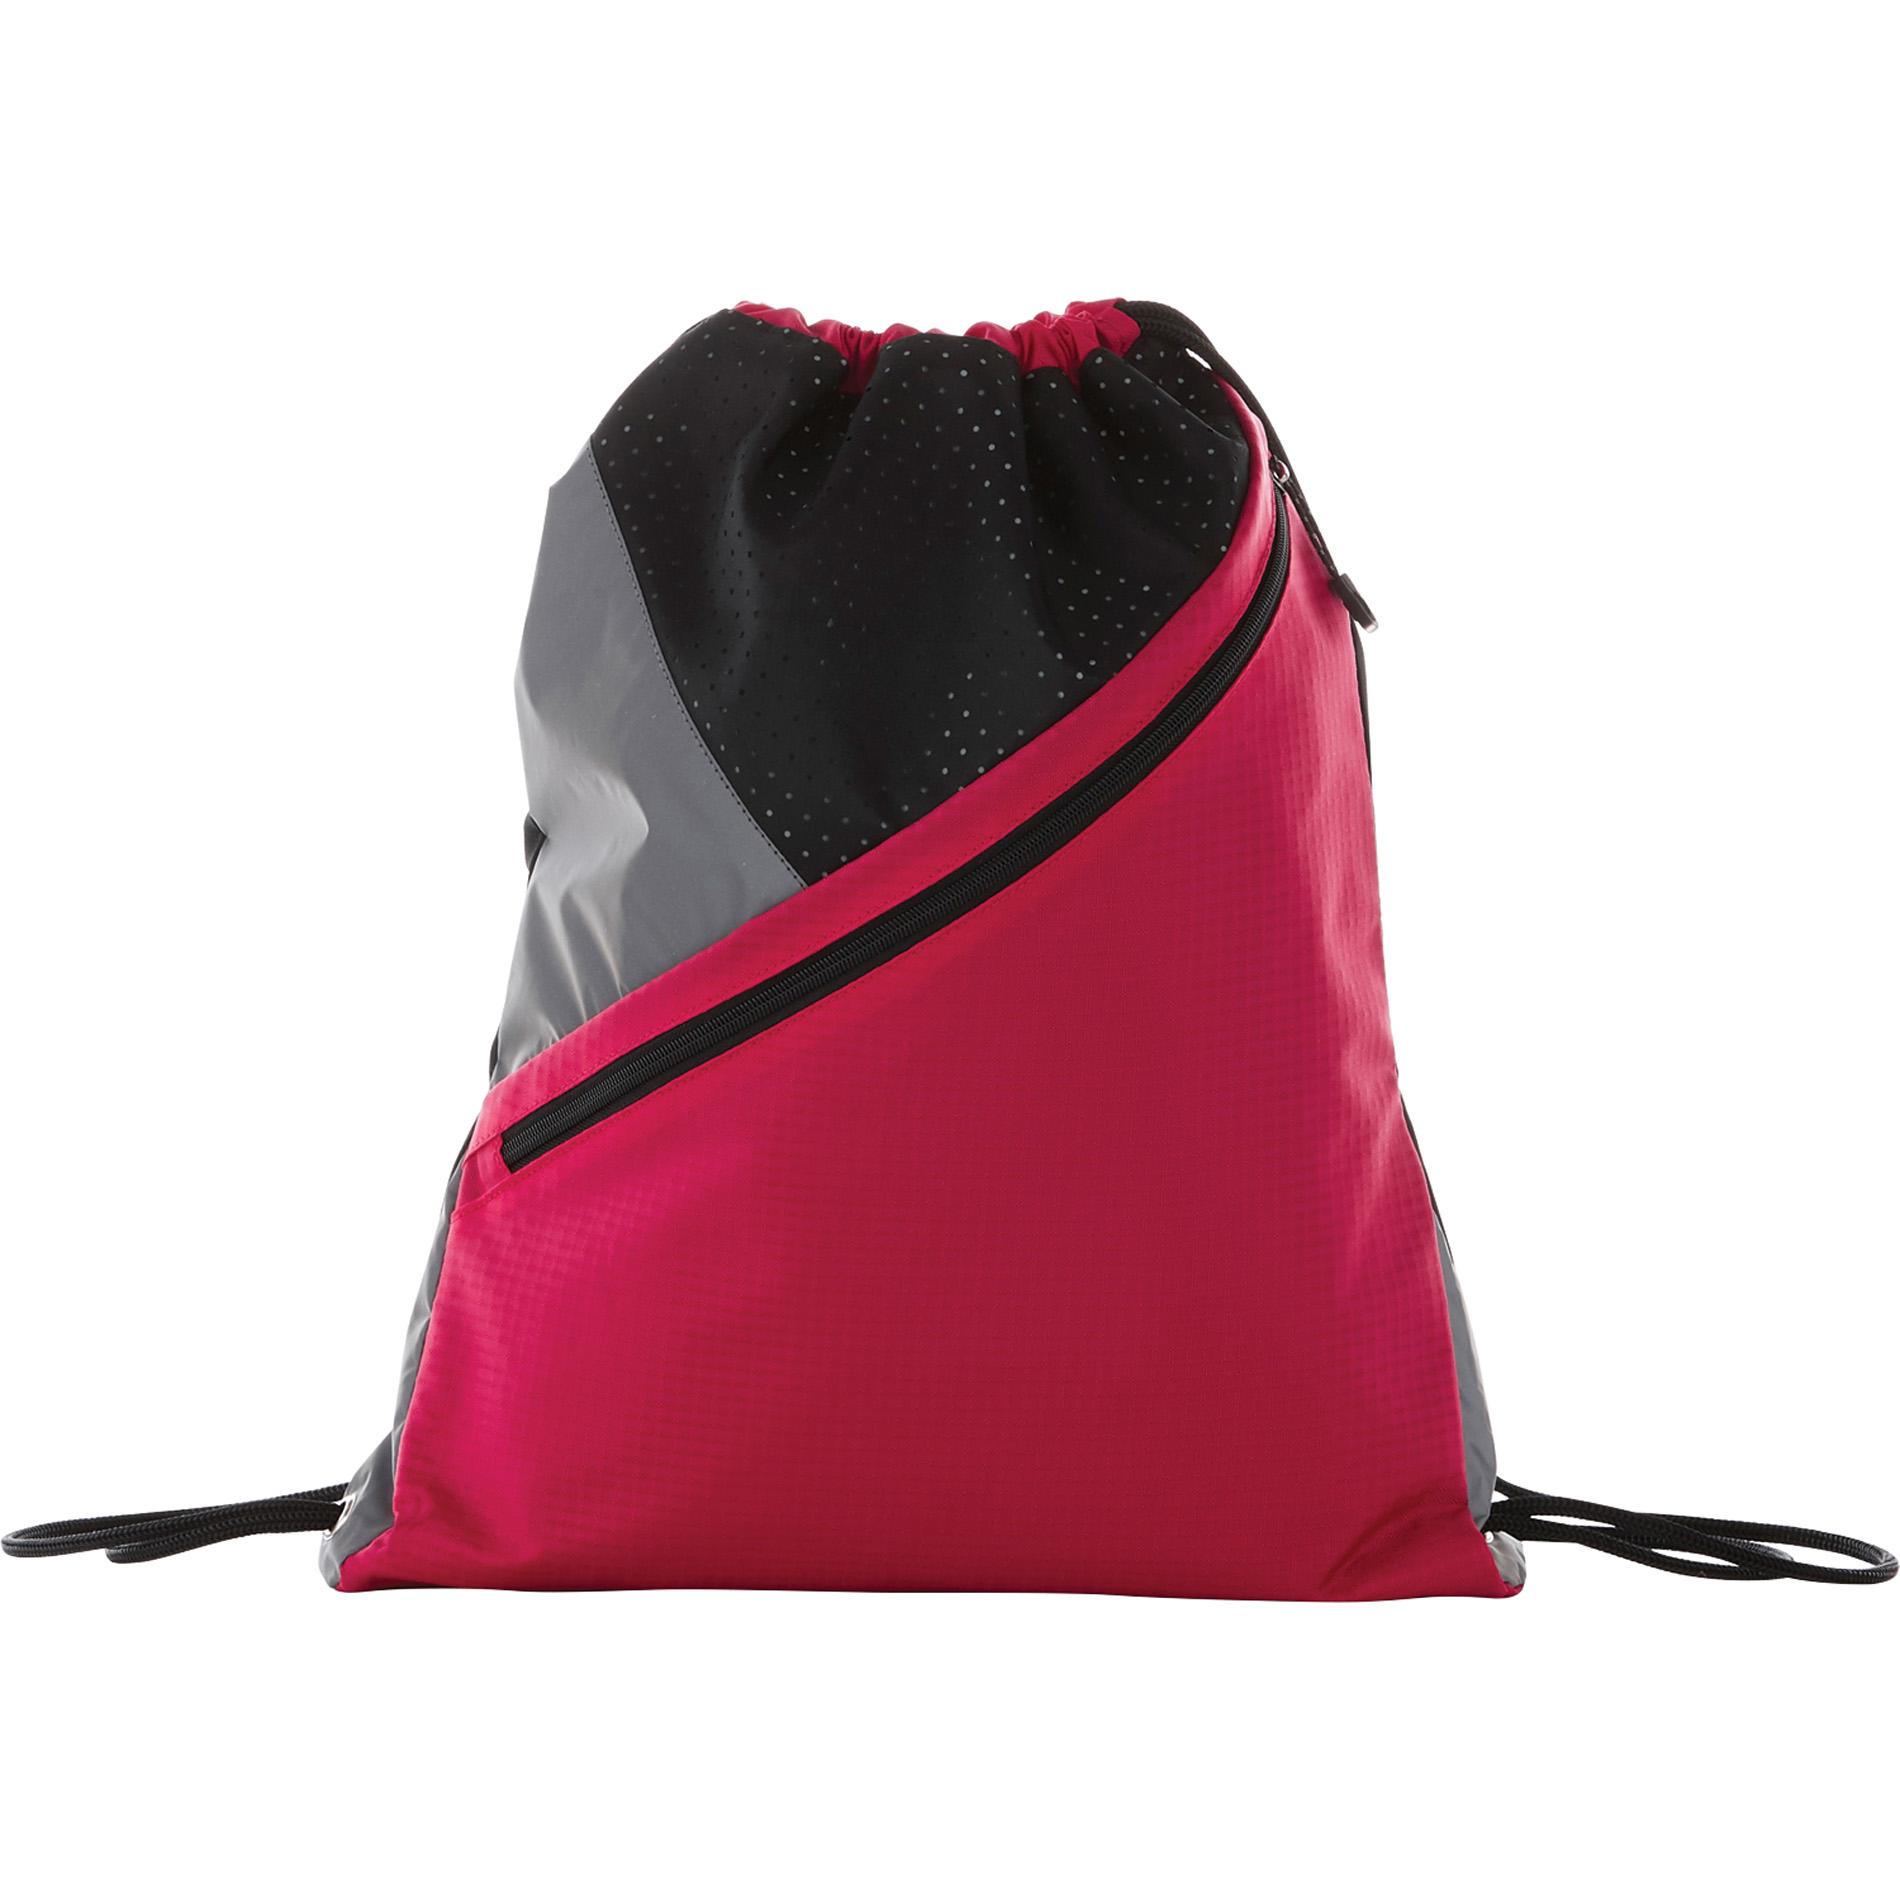 Slazenger 6050-72 - Competition Zip Drawstring Sportspack